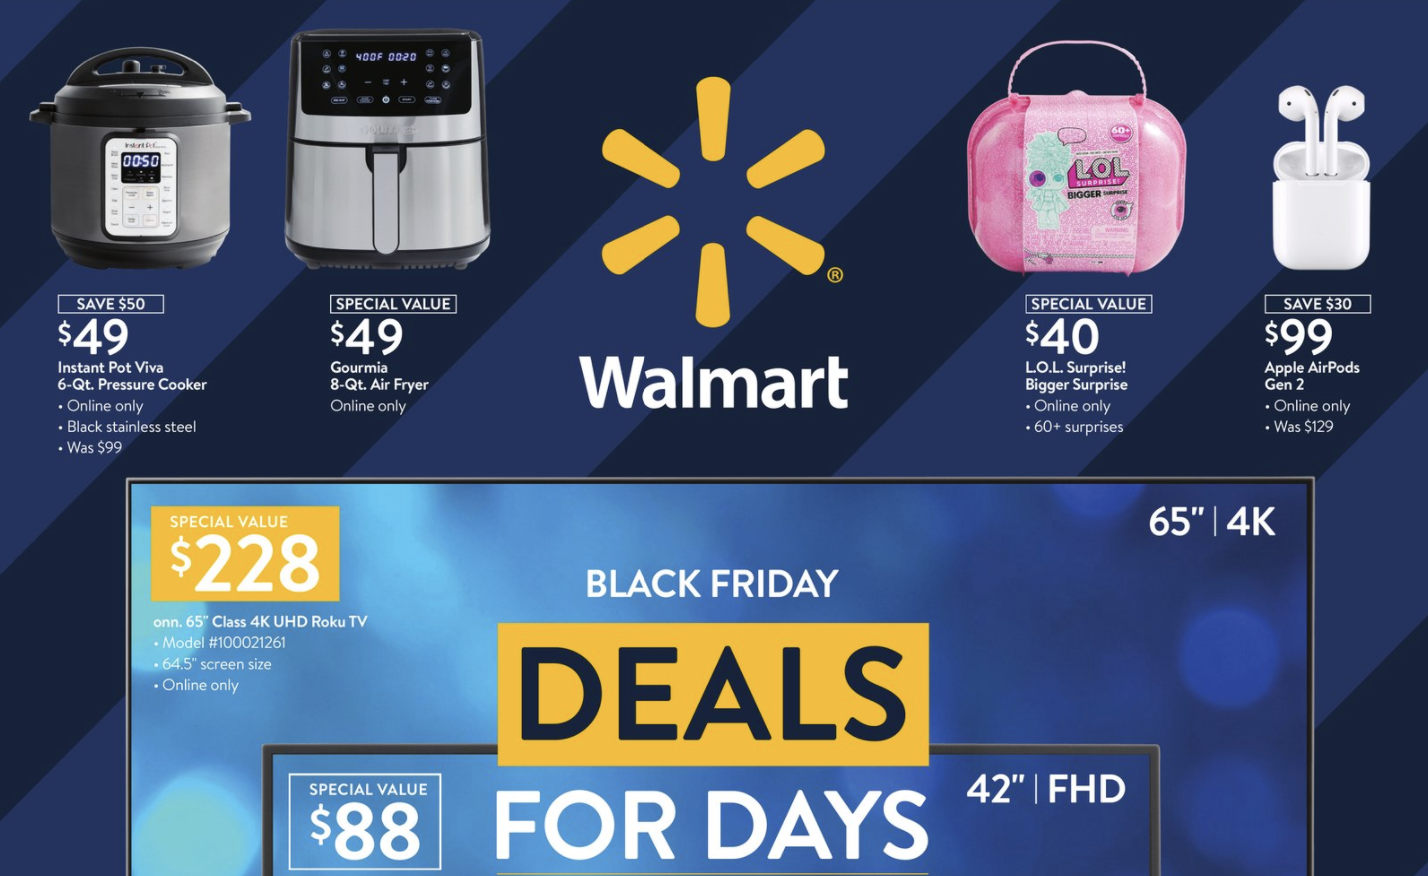 Walmart Black Friday Deals Three Sales Events Beginning Nov 4